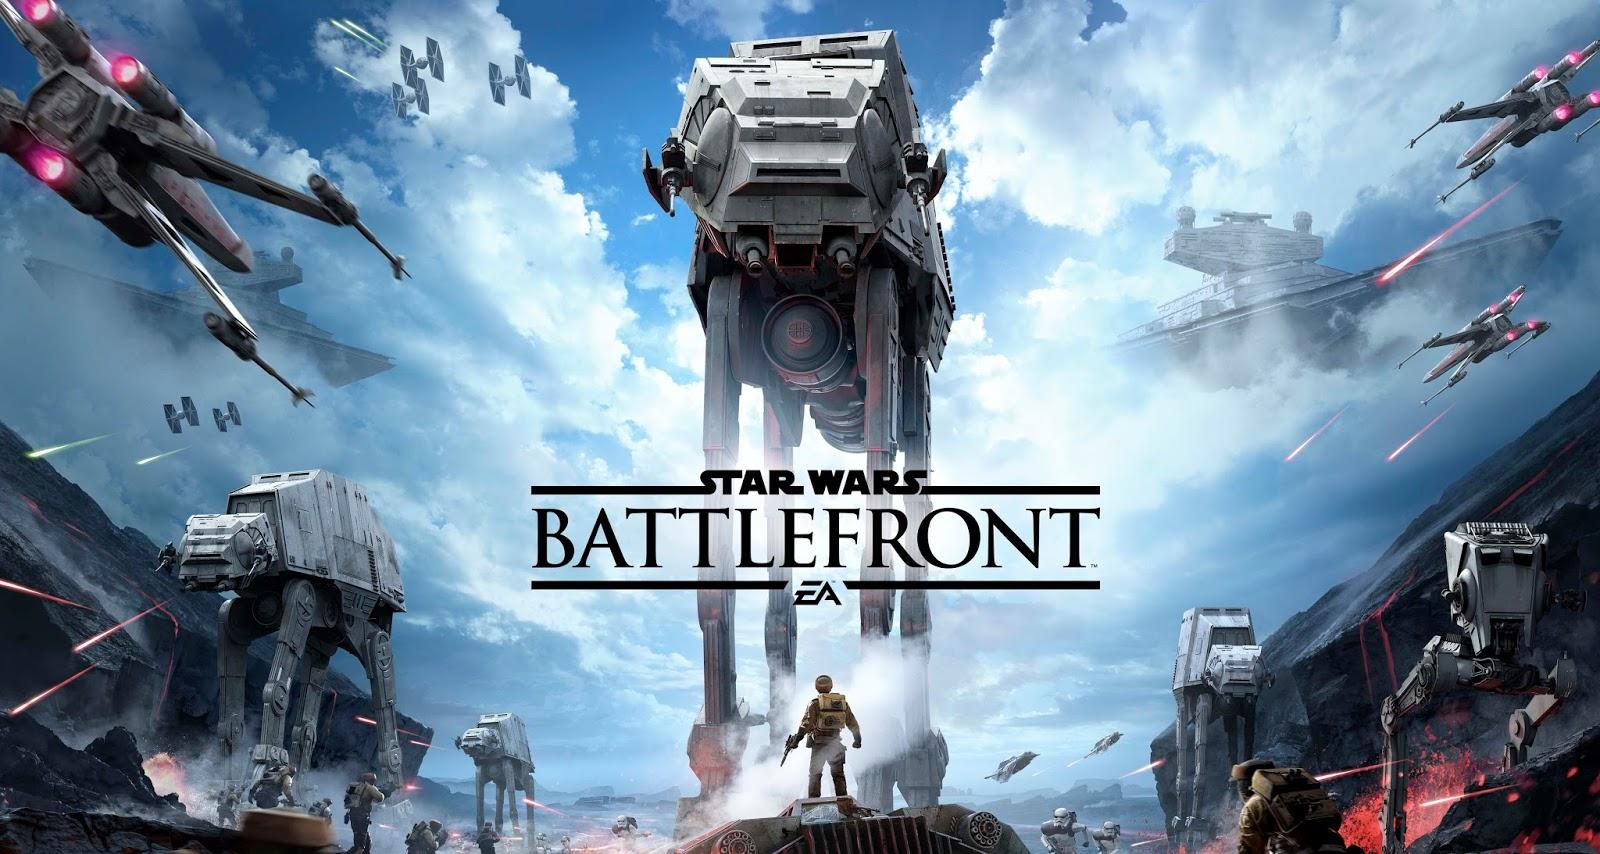 Assinantes do EA Access já podem jogar Star Wars Battlefront